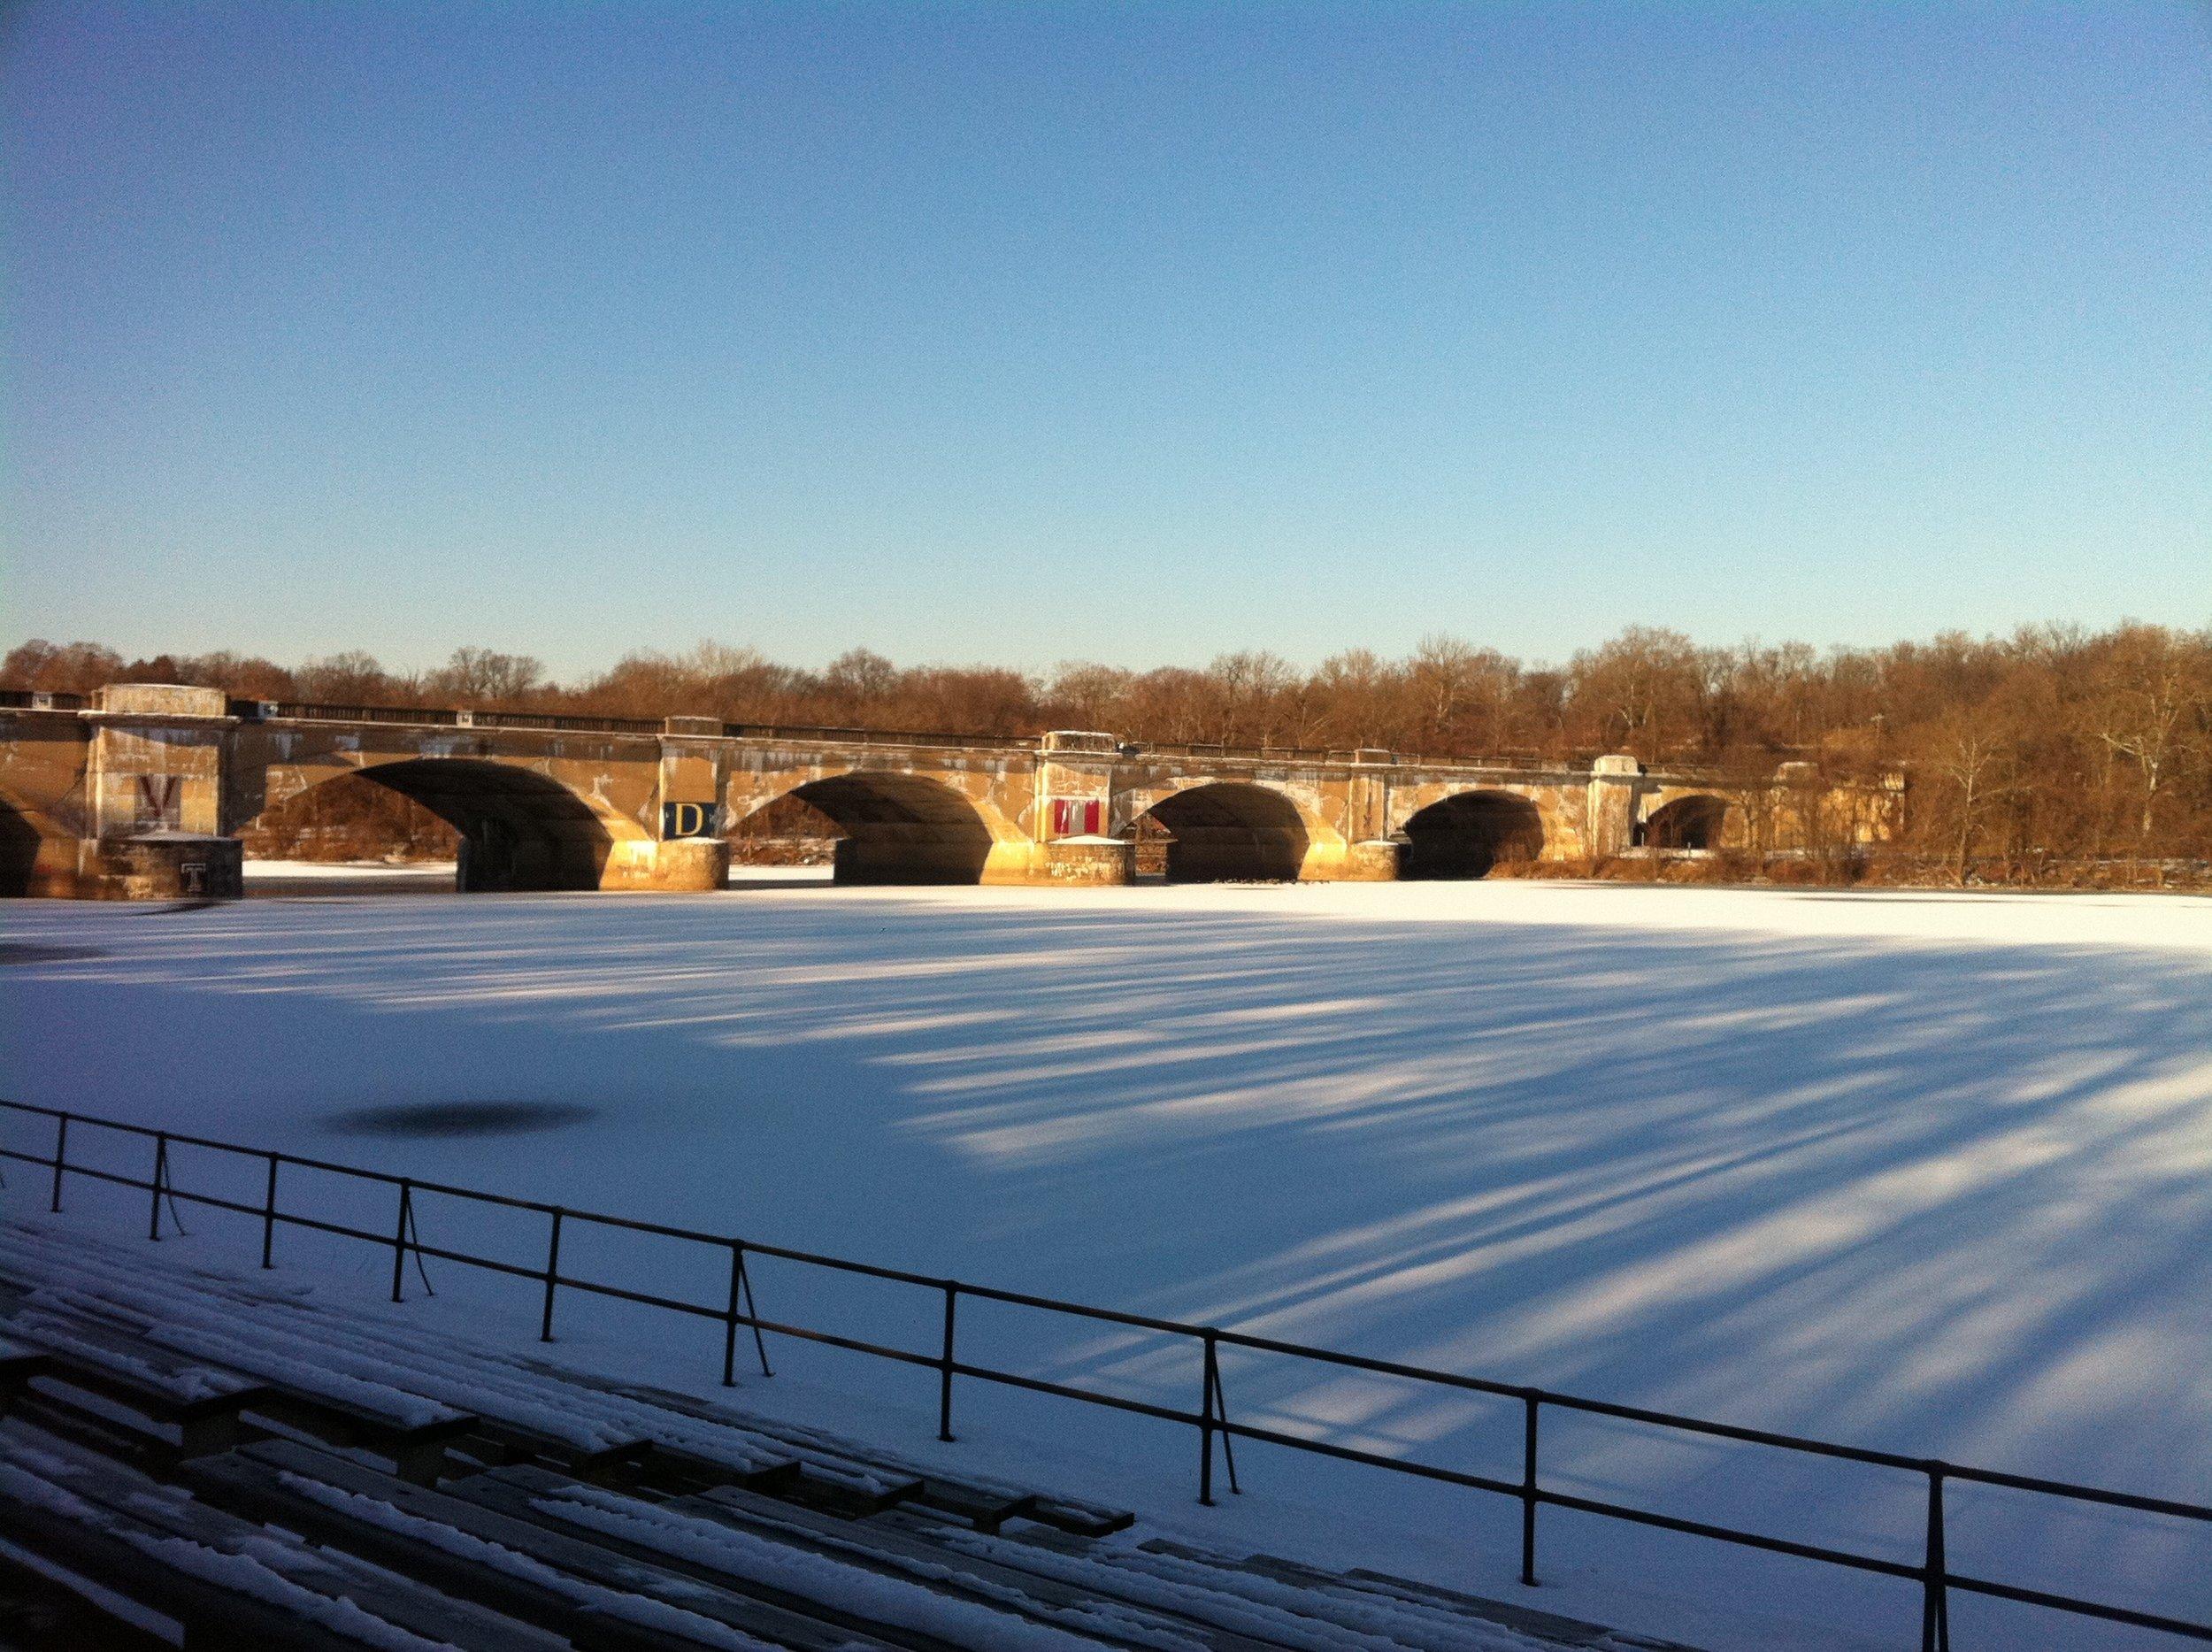 Common Philly winter running scene.